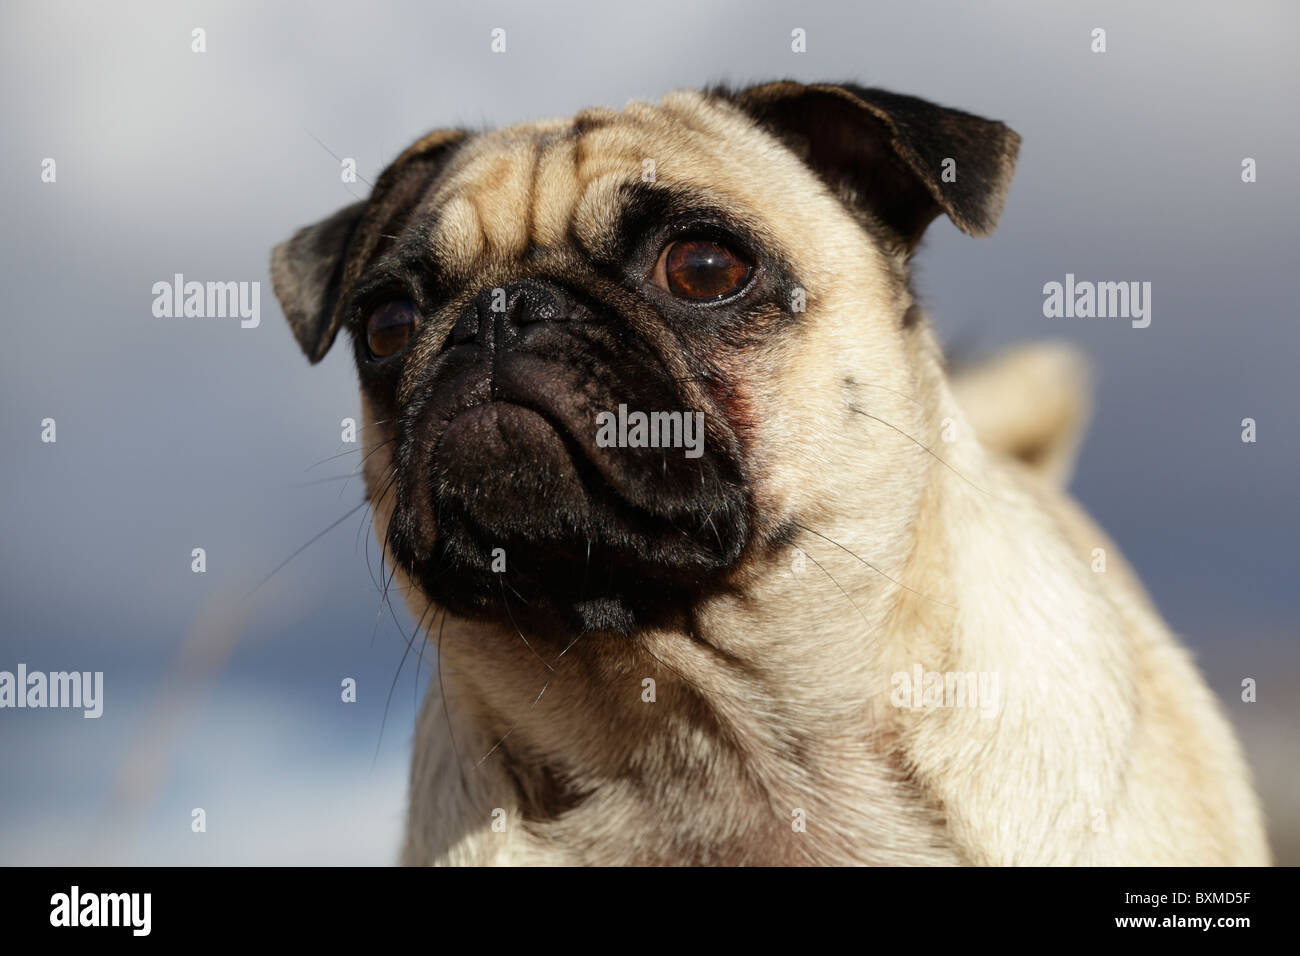 A pensive looking pet pug dog. - Stock Image